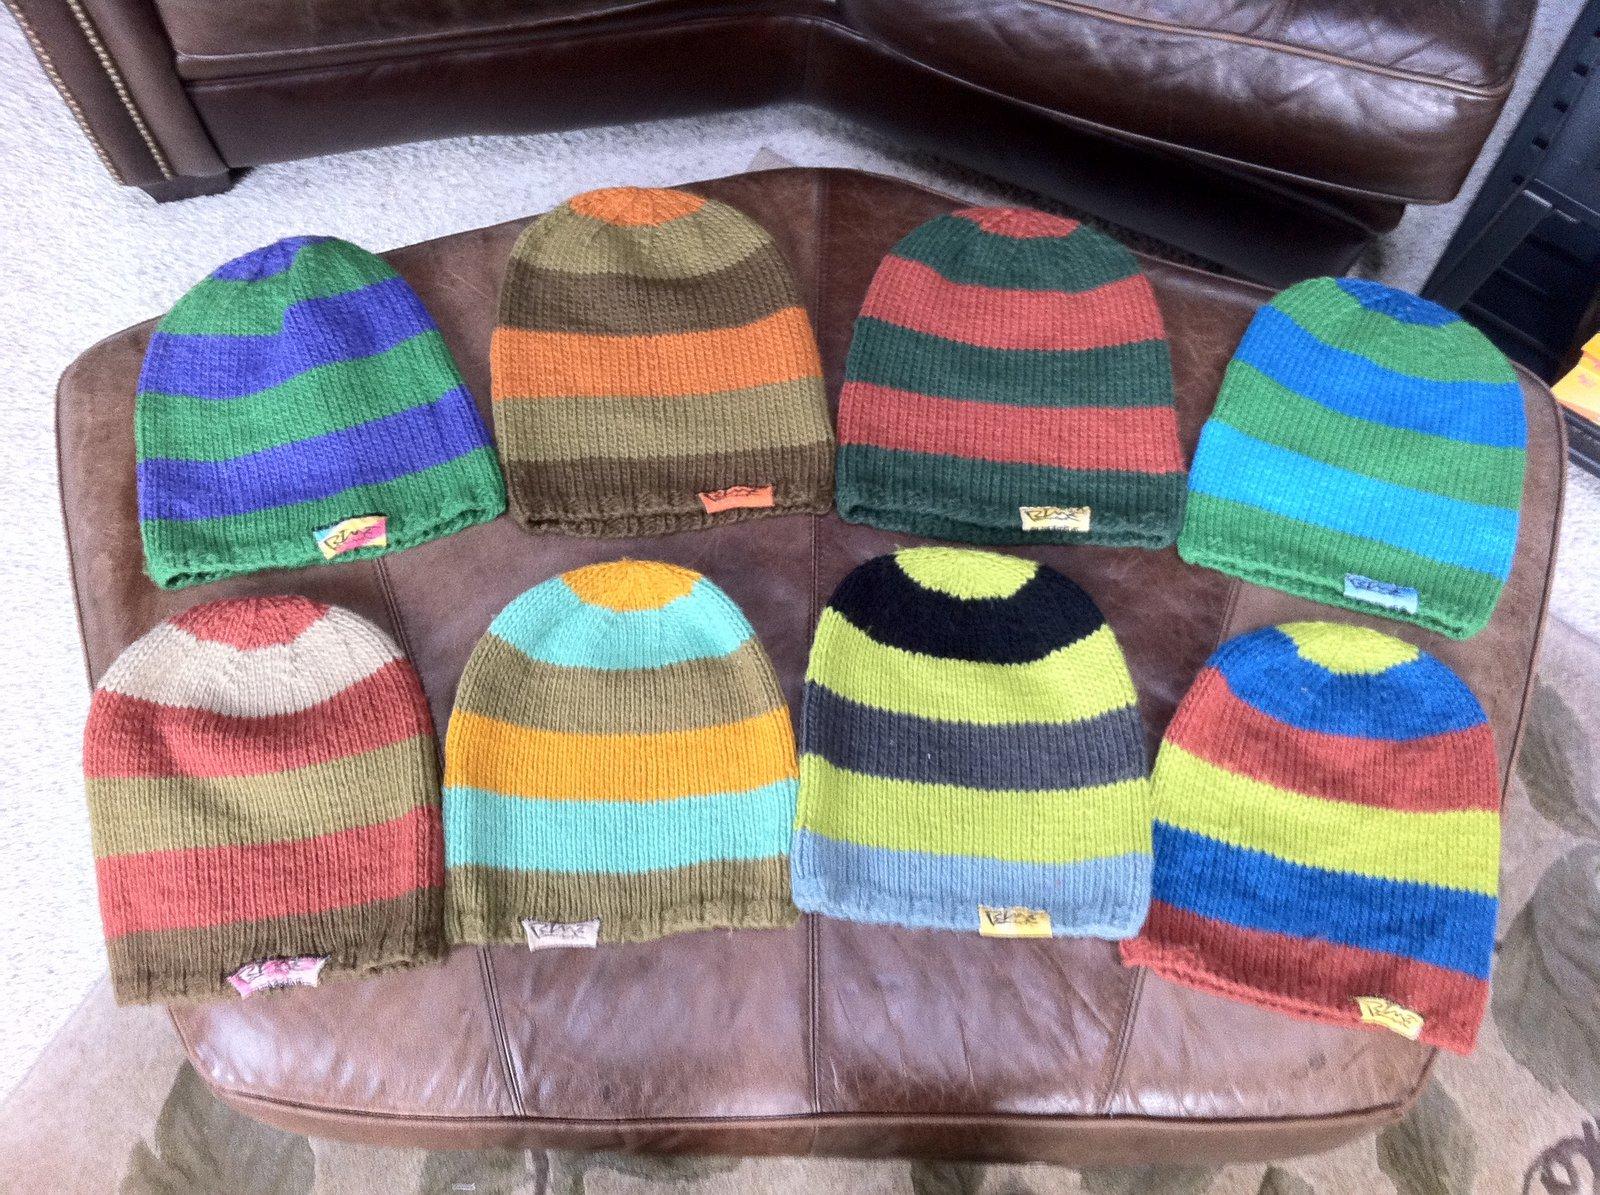 2008/09 rime hats for sale